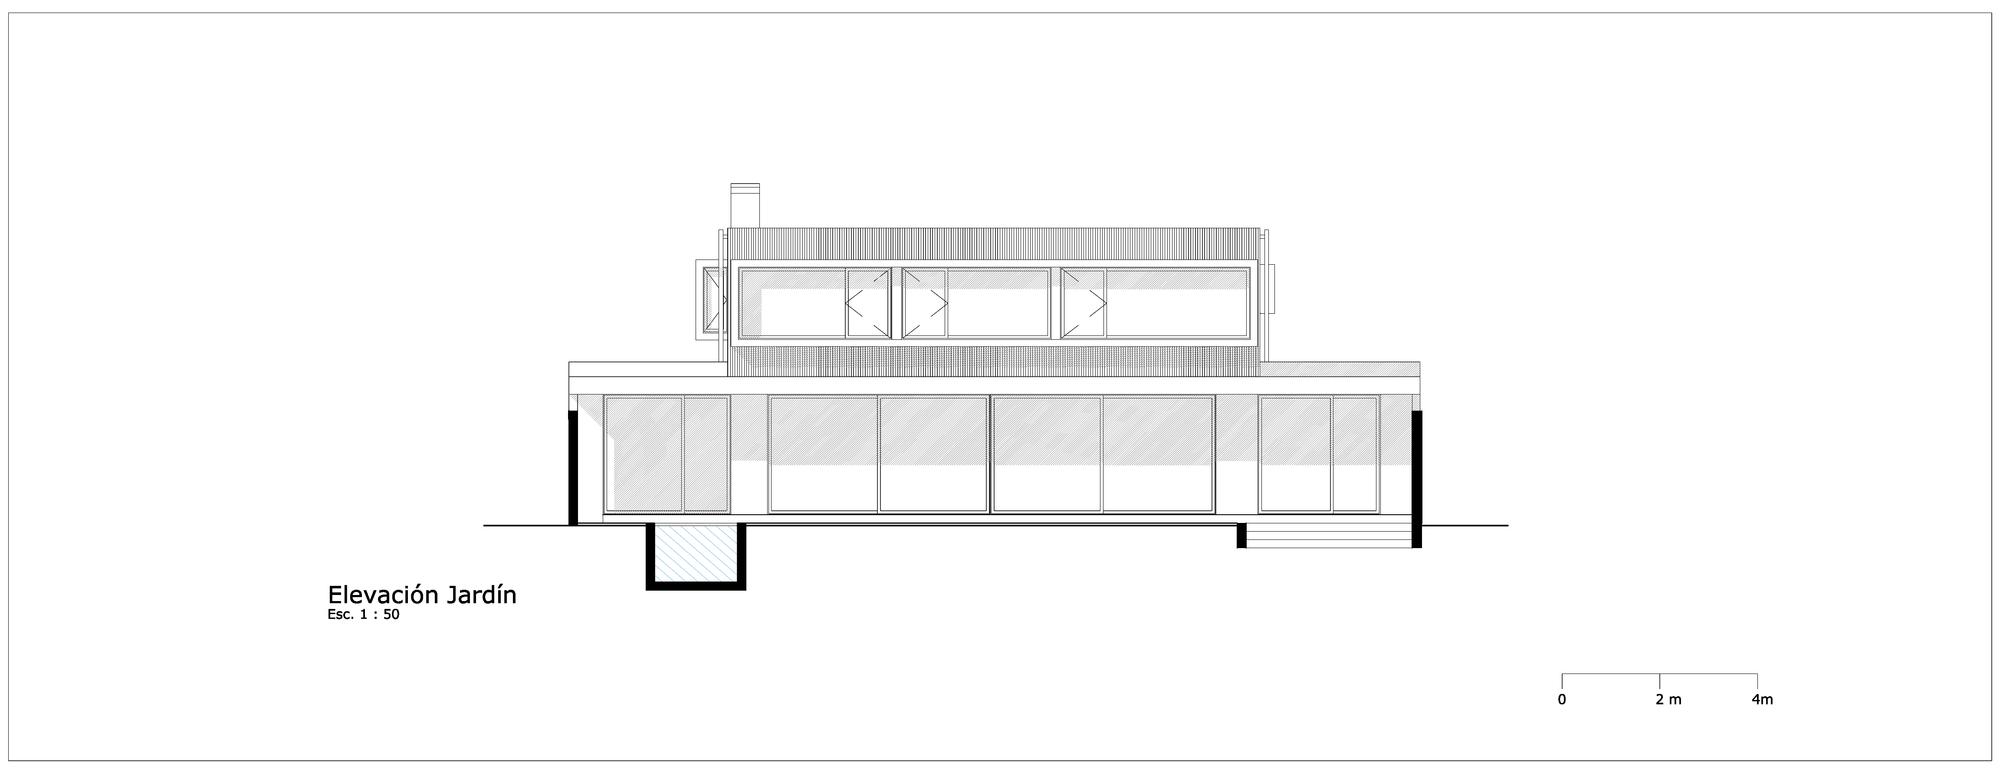 Galer a de casa m laga prietoschaffer arquitectos 17 - Arquitectos interioristas malaga ...